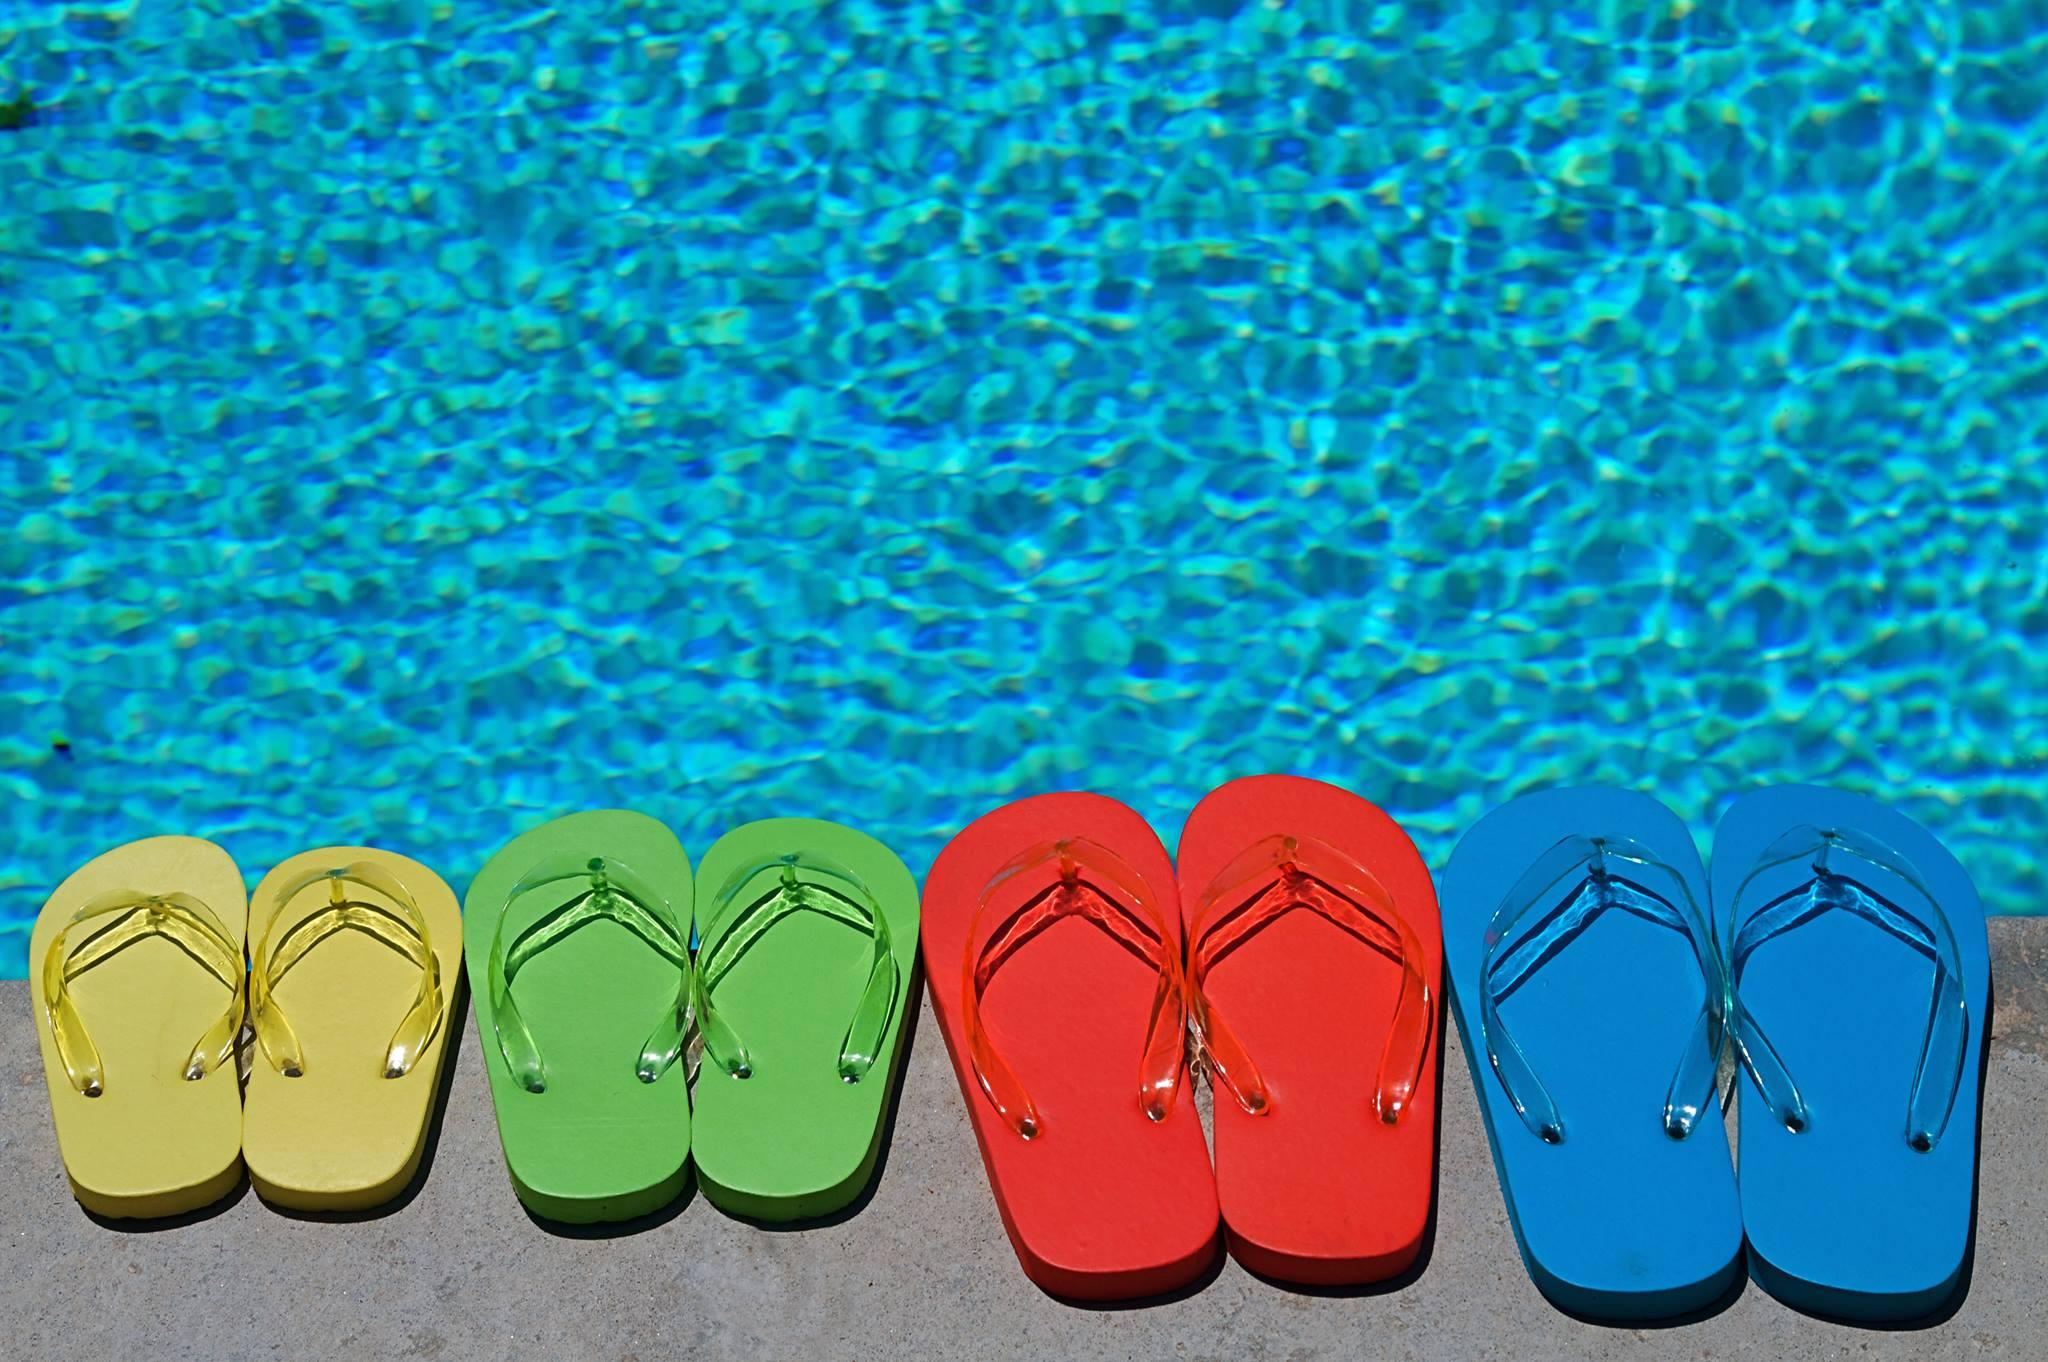 Champions Pool Repair & Service reviews | Pool & Hot Tub Service at 4676 Louetta Rd - Spring TX